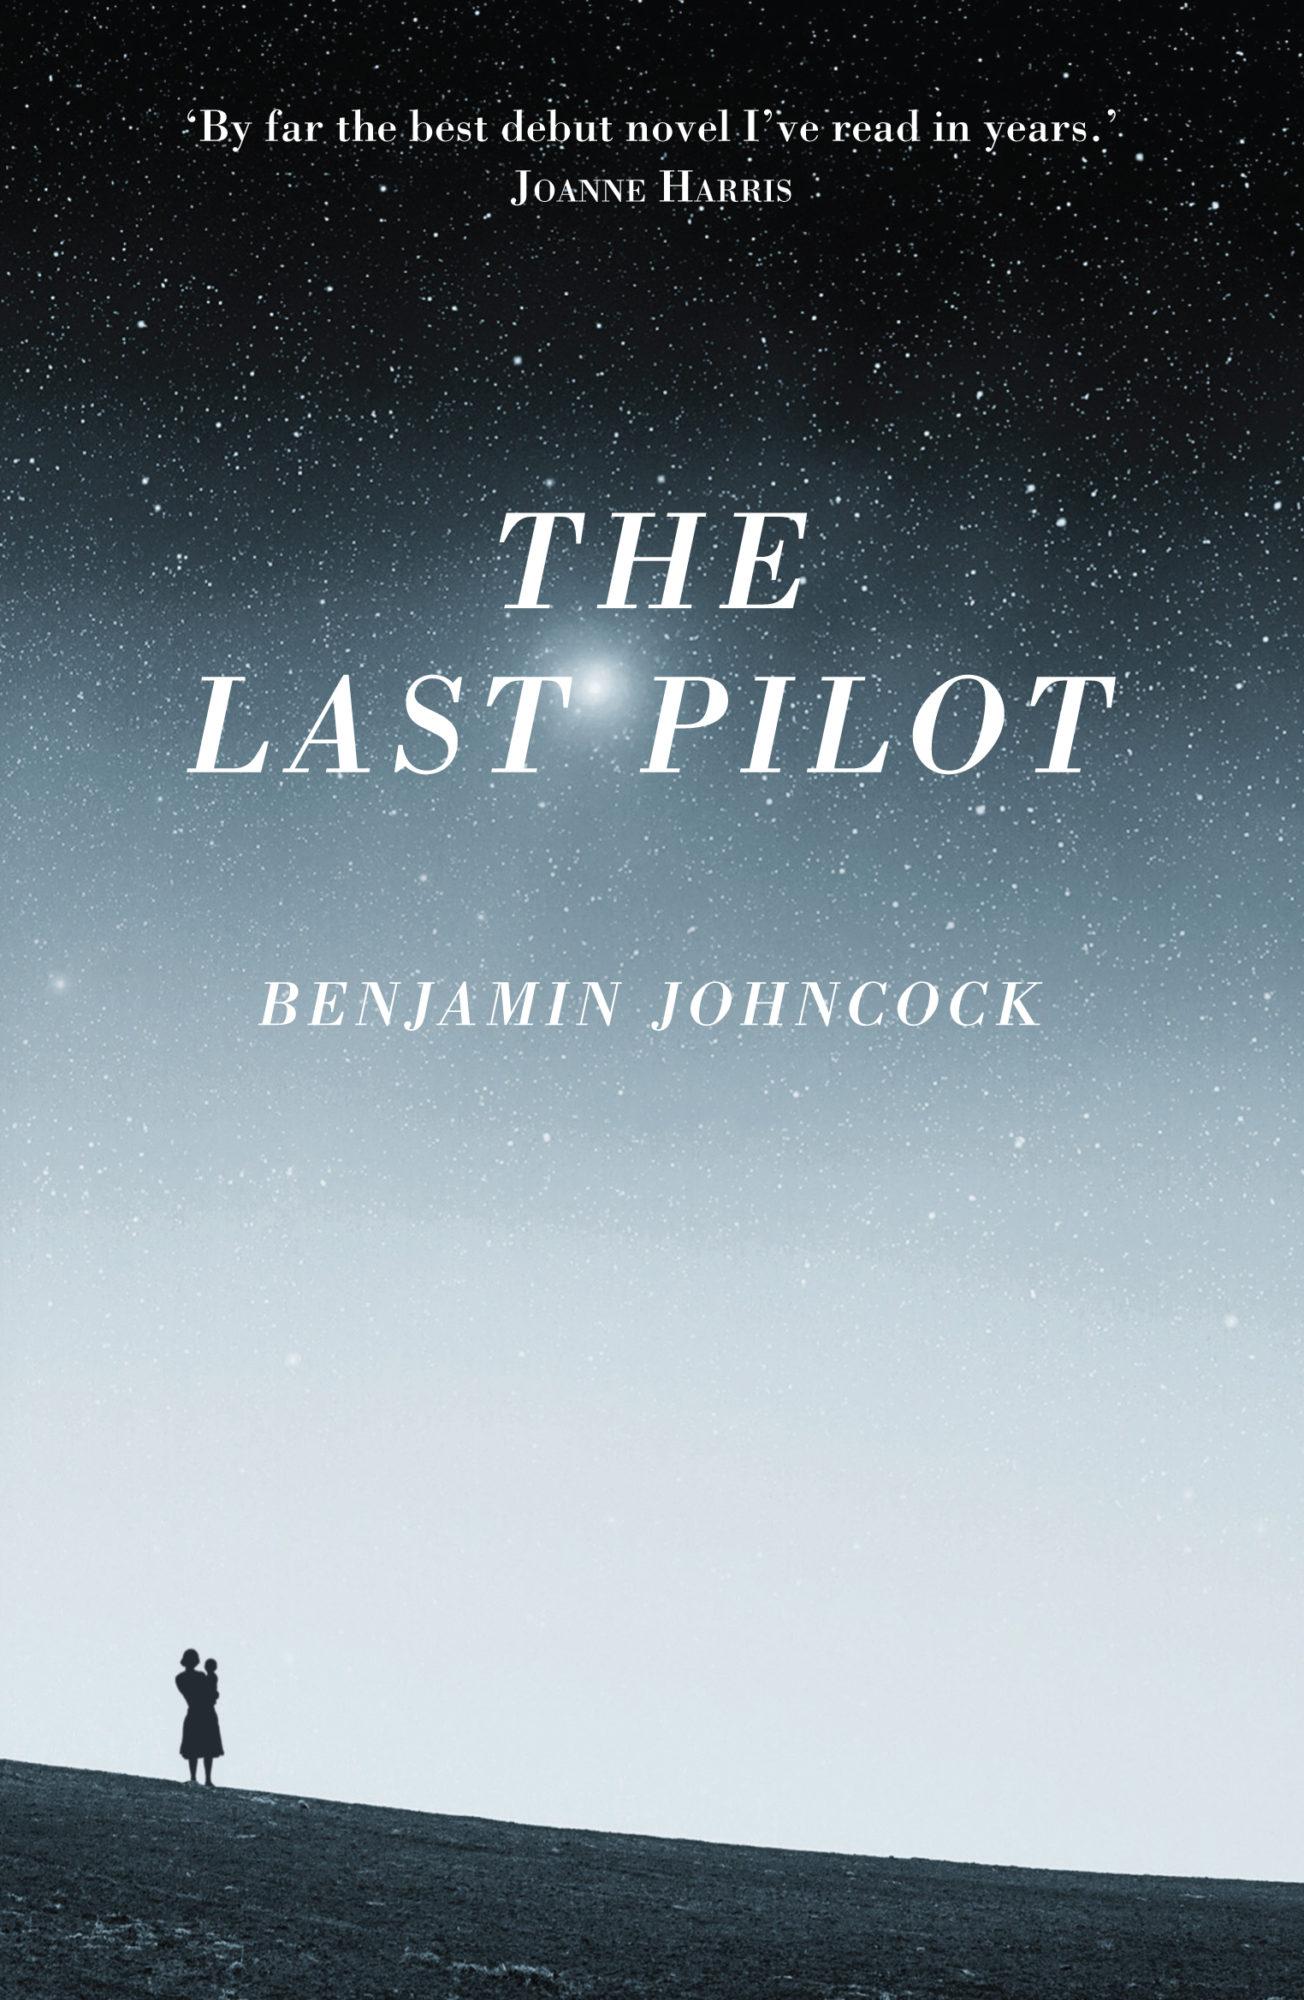 The Last Pilot